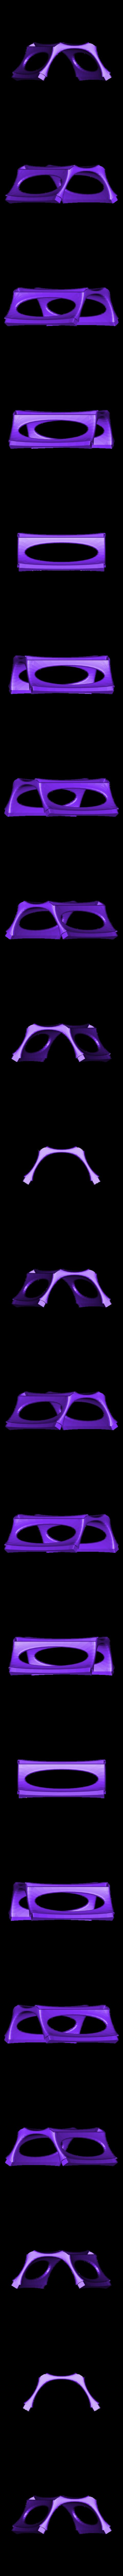 gustavino_v3.stl Download STL file GustaVino Original • 3D printer model, GustaVino